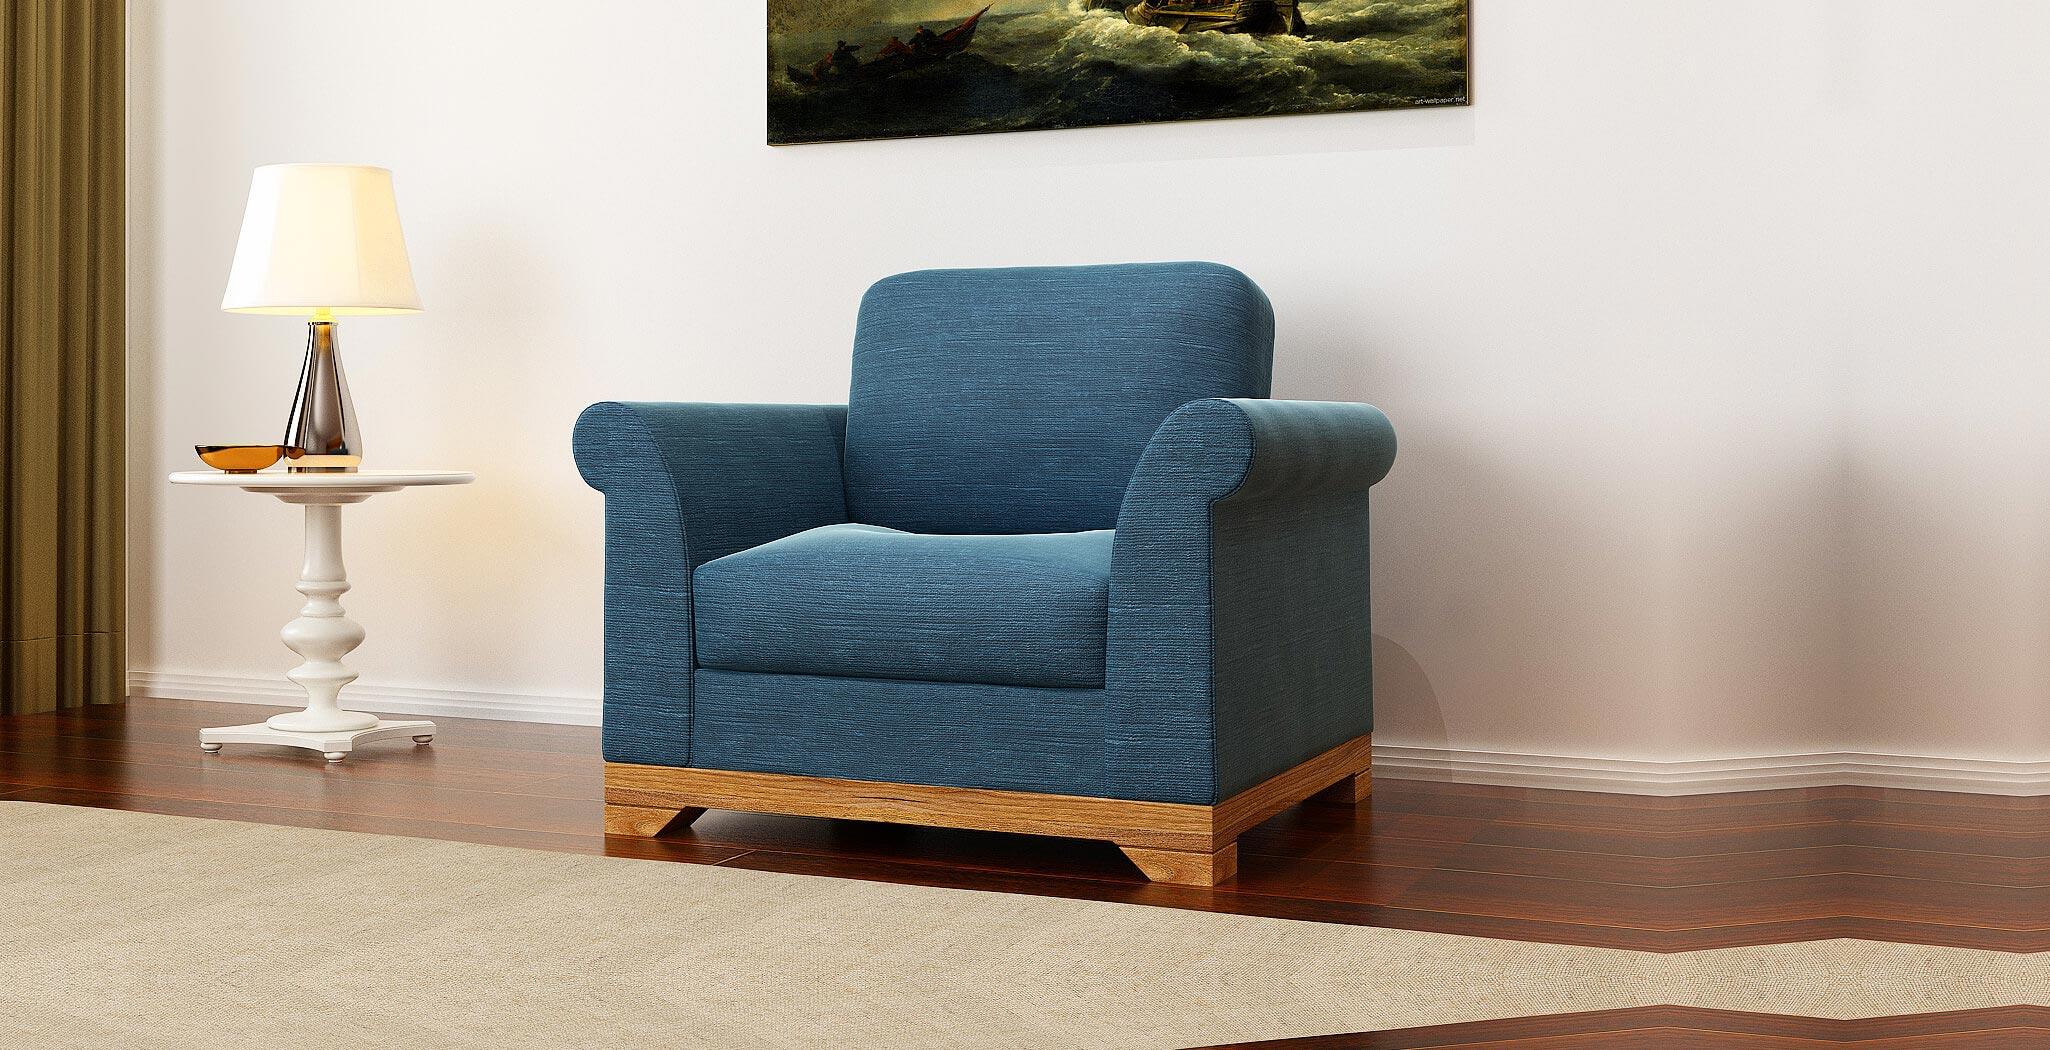 denver chair furniture gallery 2